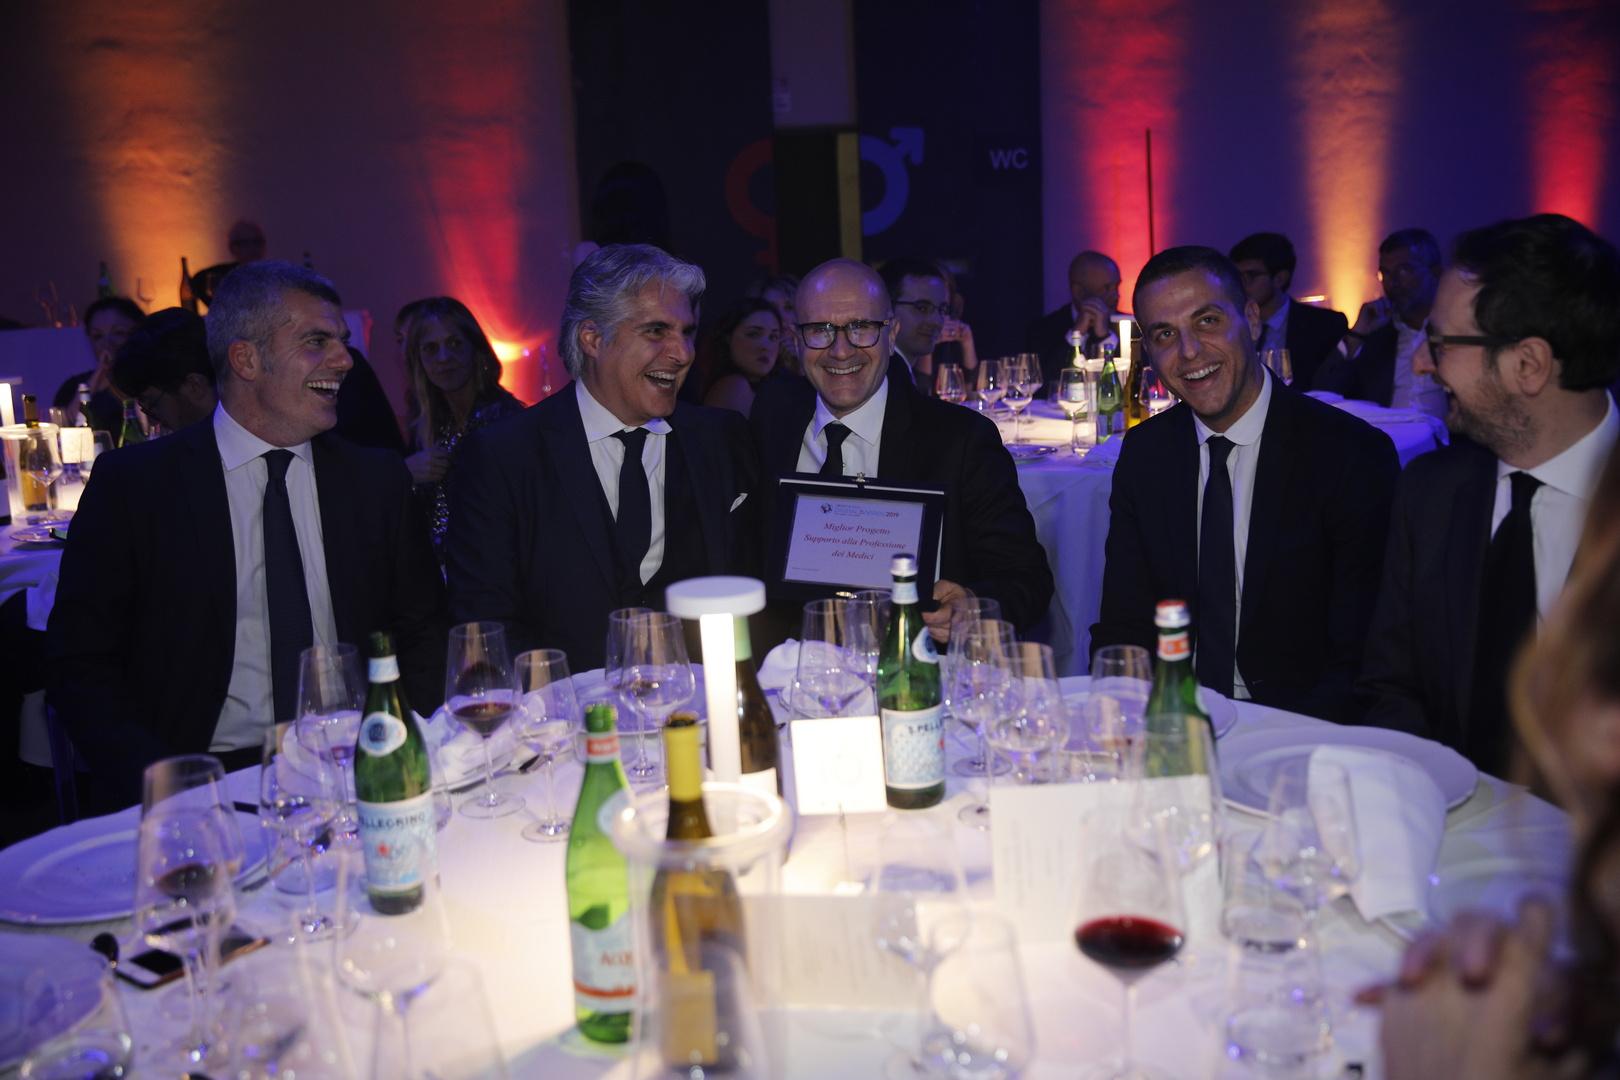 AboutPharma Digital Awards 2019 (80)